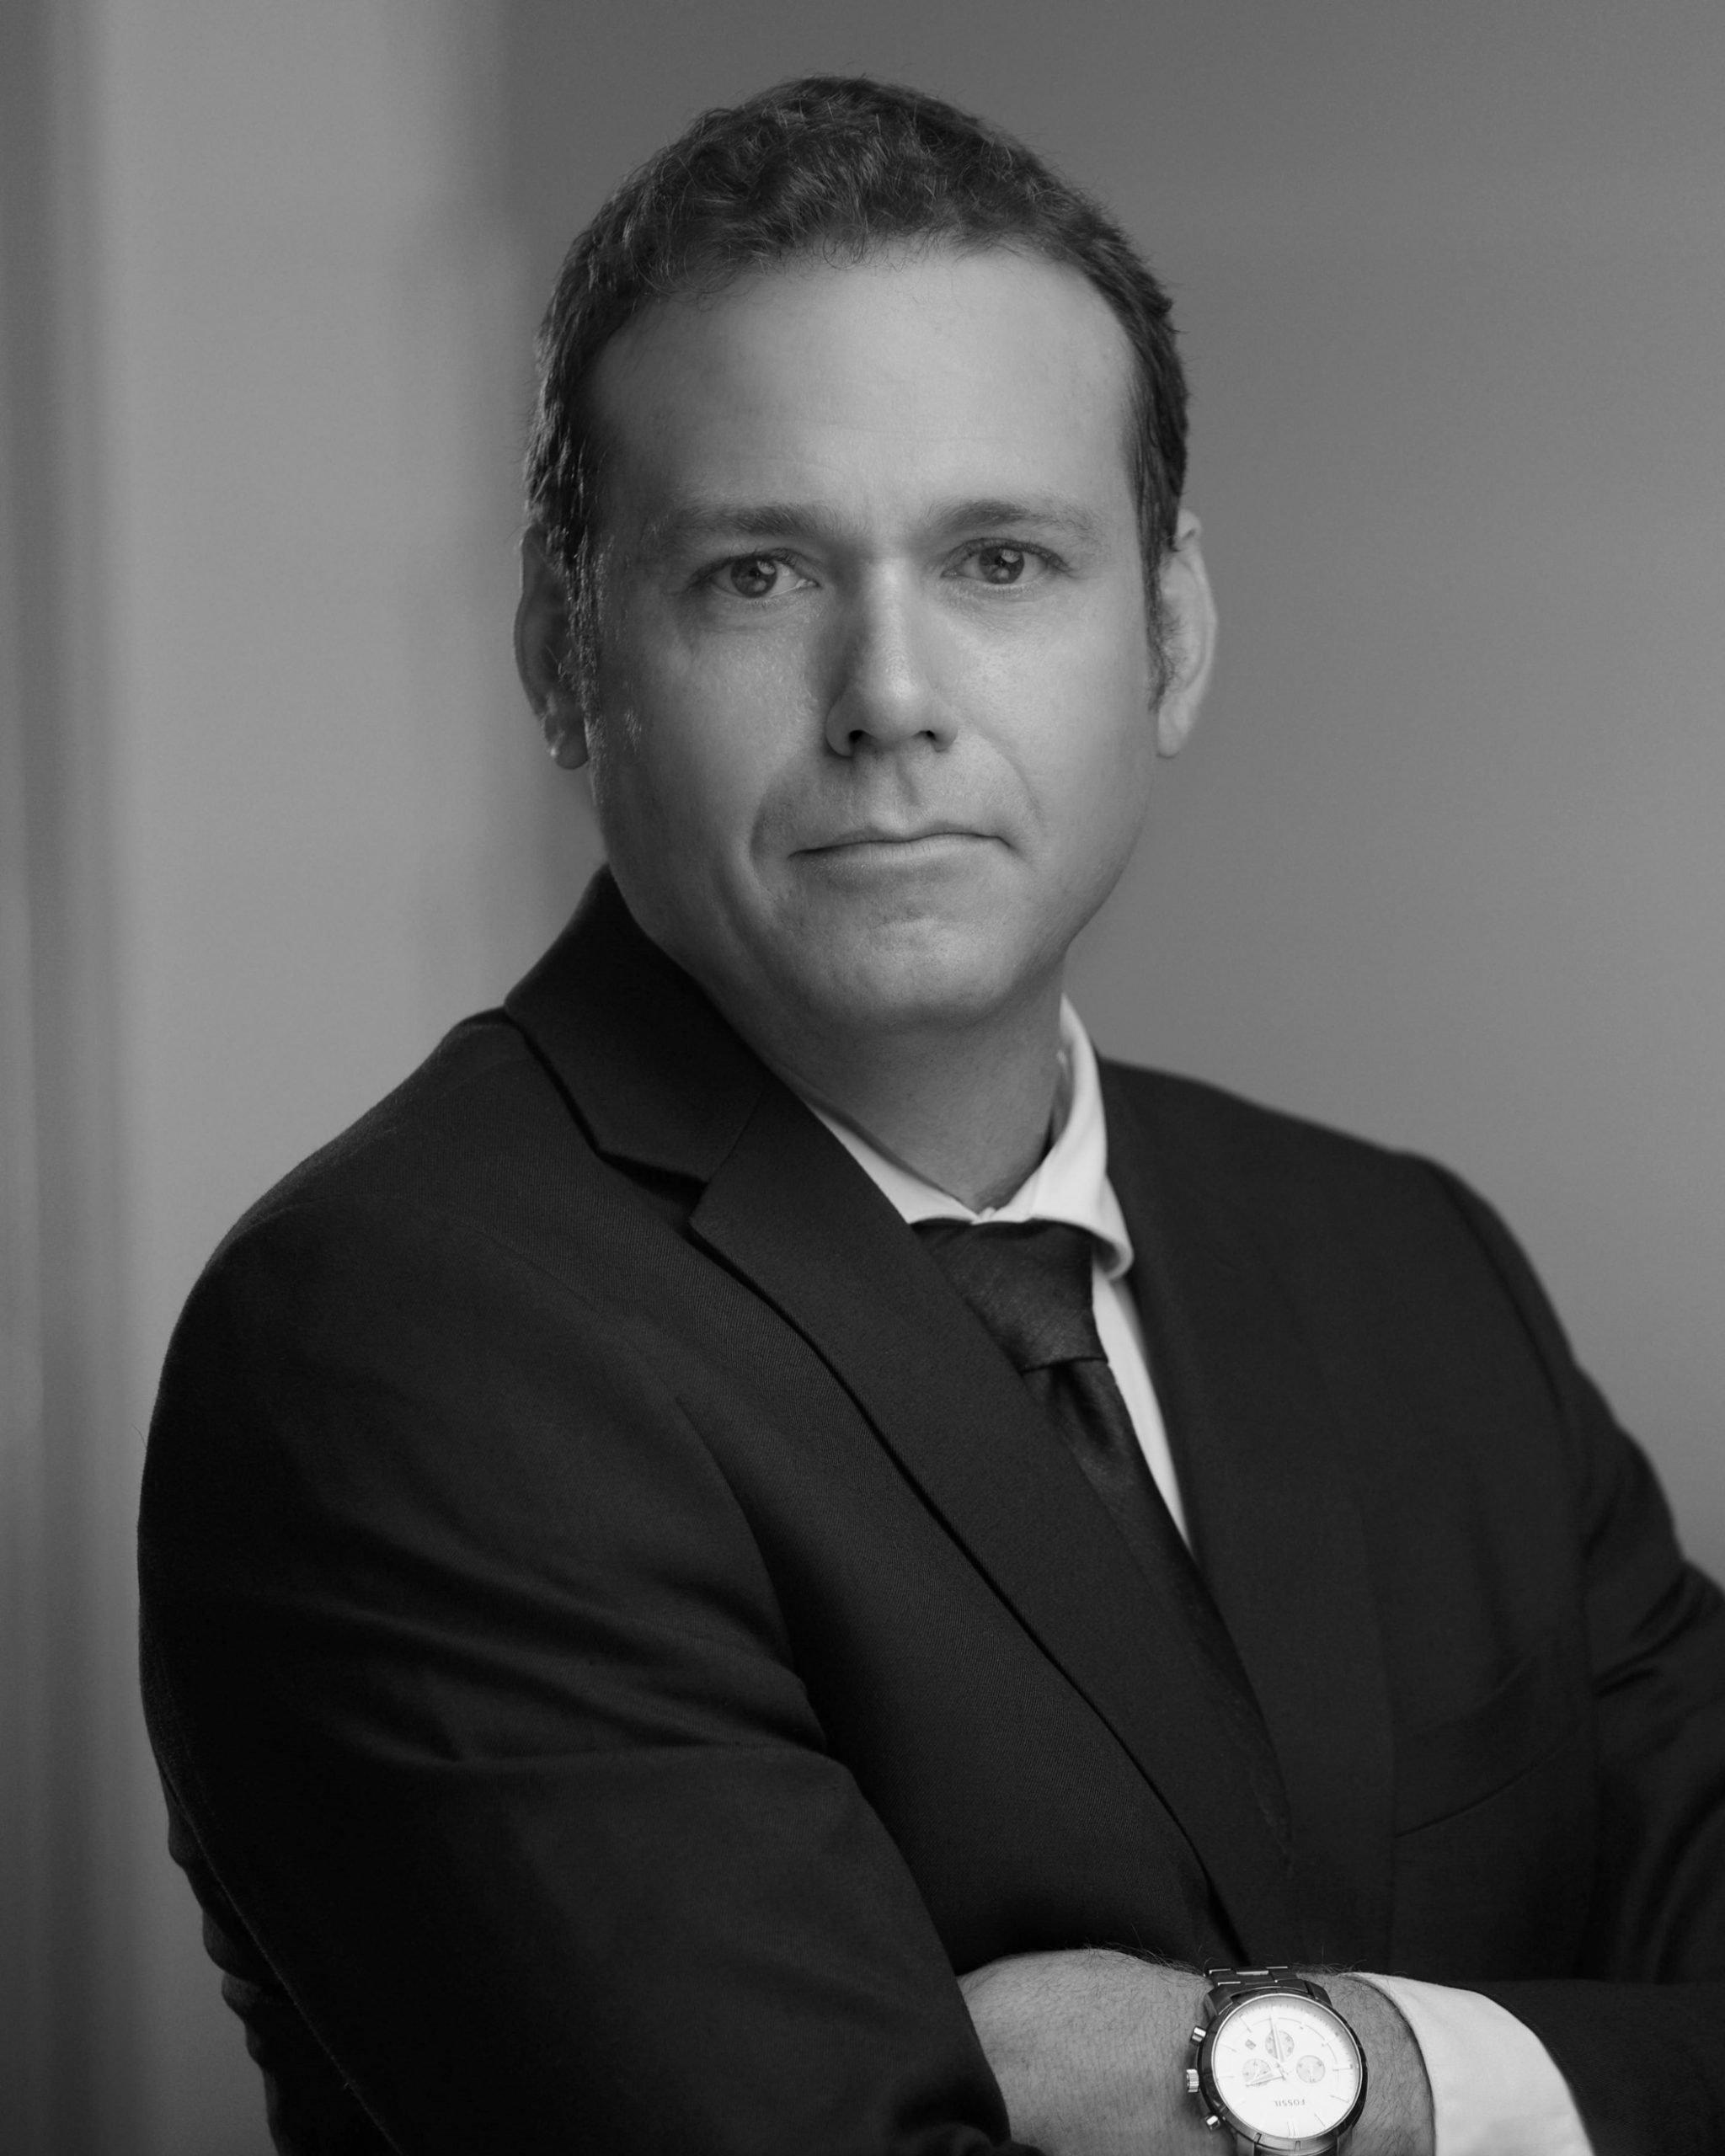 Sean P. Collins